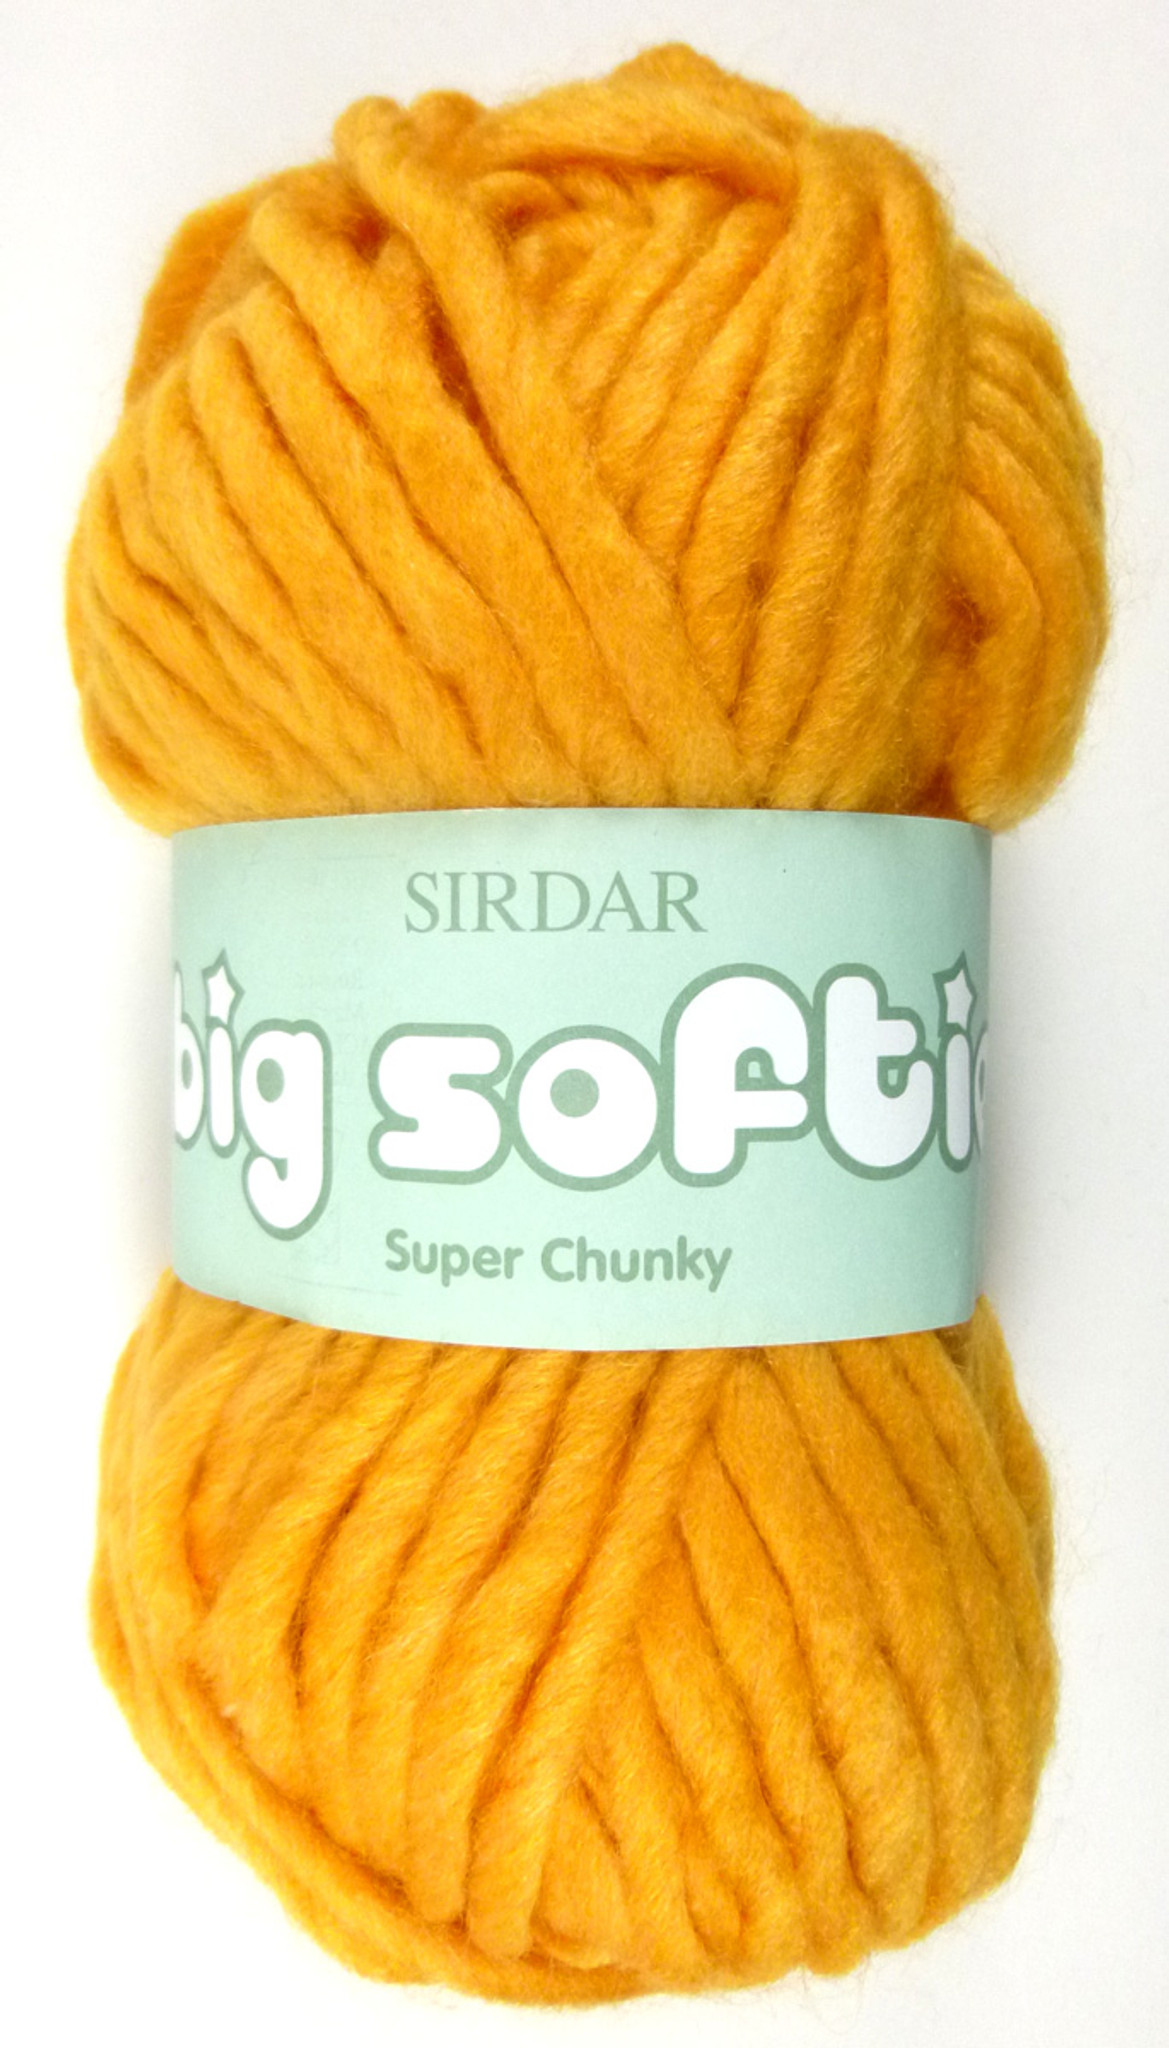 Sirdar Ladies /& Mens Sweaters Big Softie Knitting Patte... Free UK P/&P